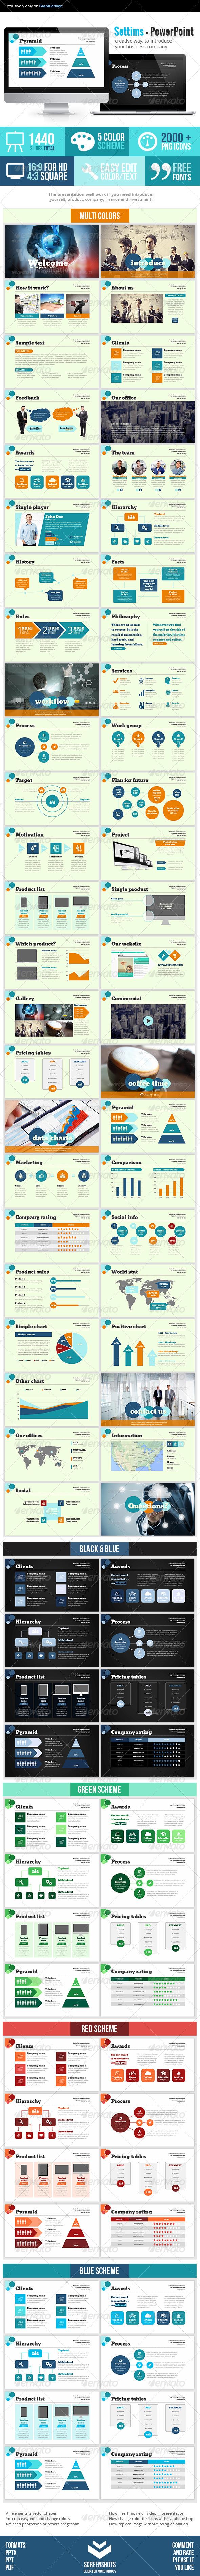 GraphicRiver Settims Powerpoint Presentation 7569287